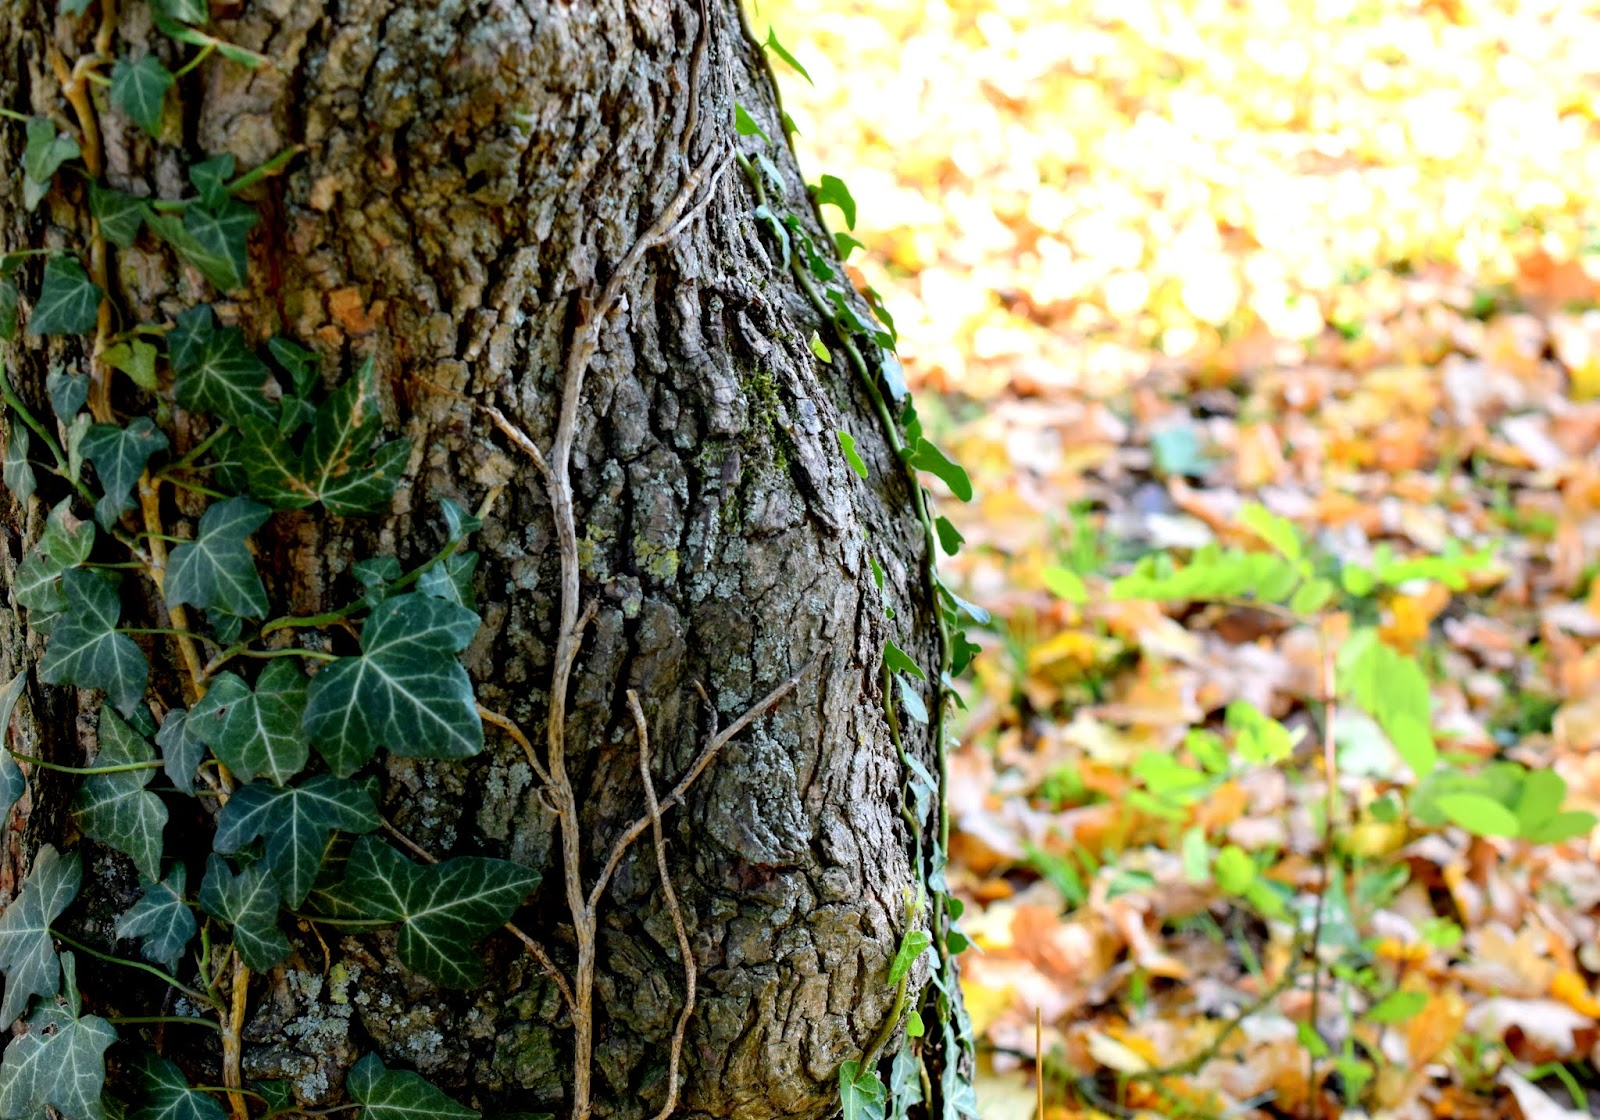 Herbst buntes Herbstlaub